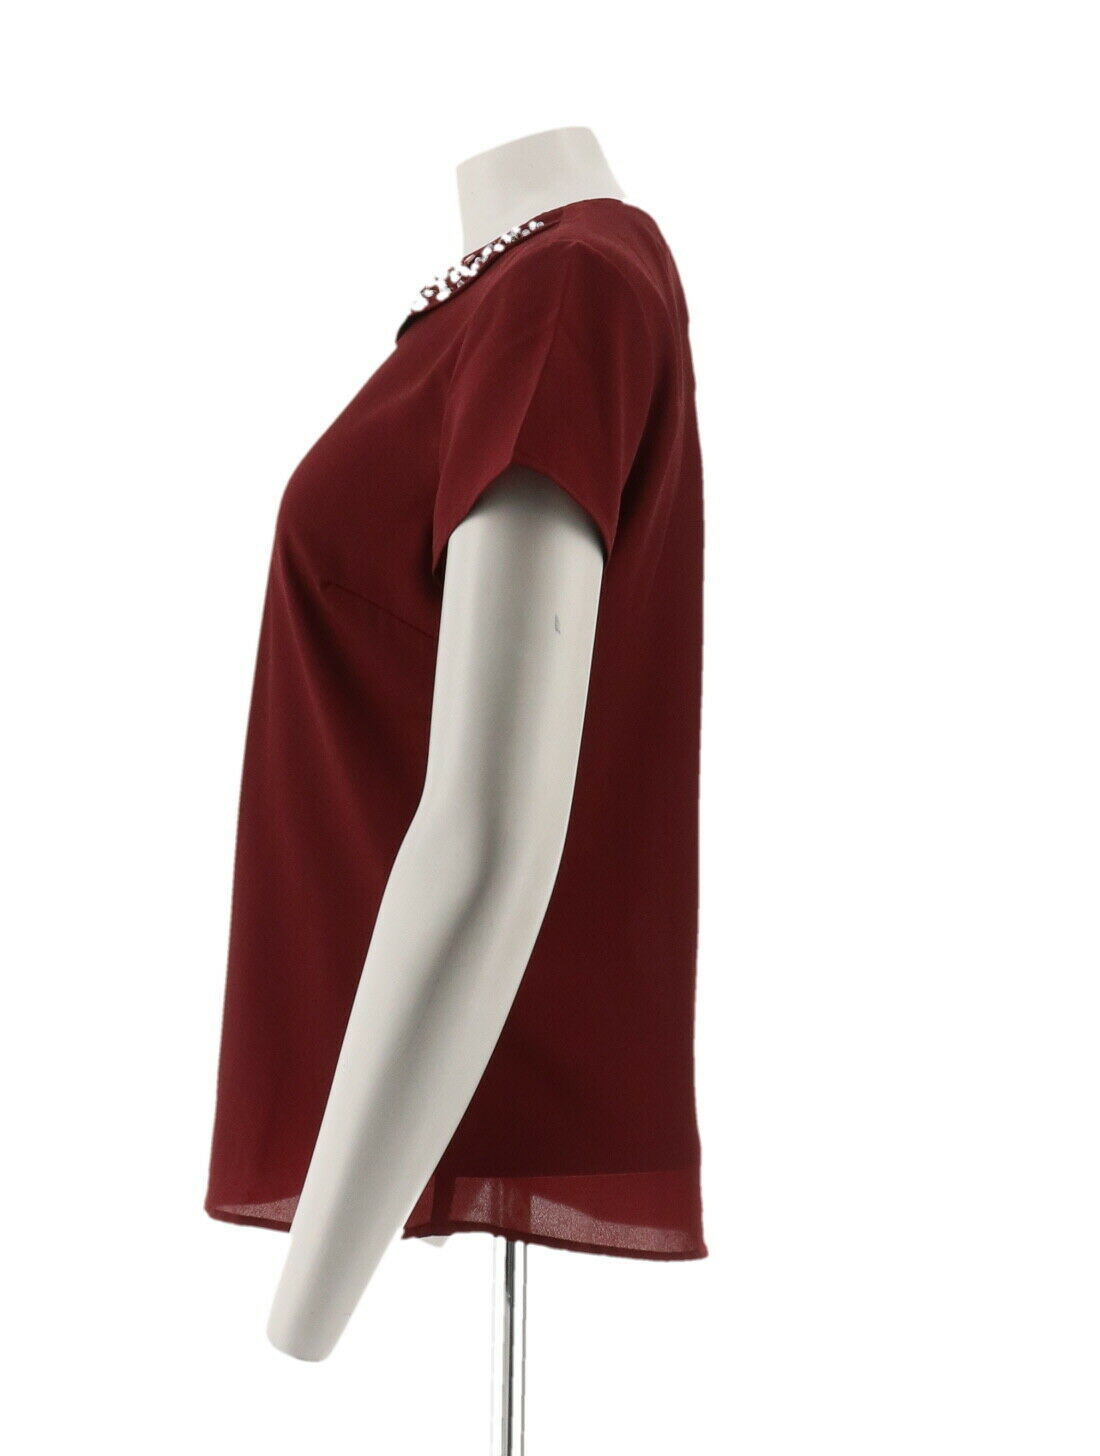 Dennis Basso Short Slv Top Embellished Peter Pan Collar Solid Wine 6 NEW A261457 image 2